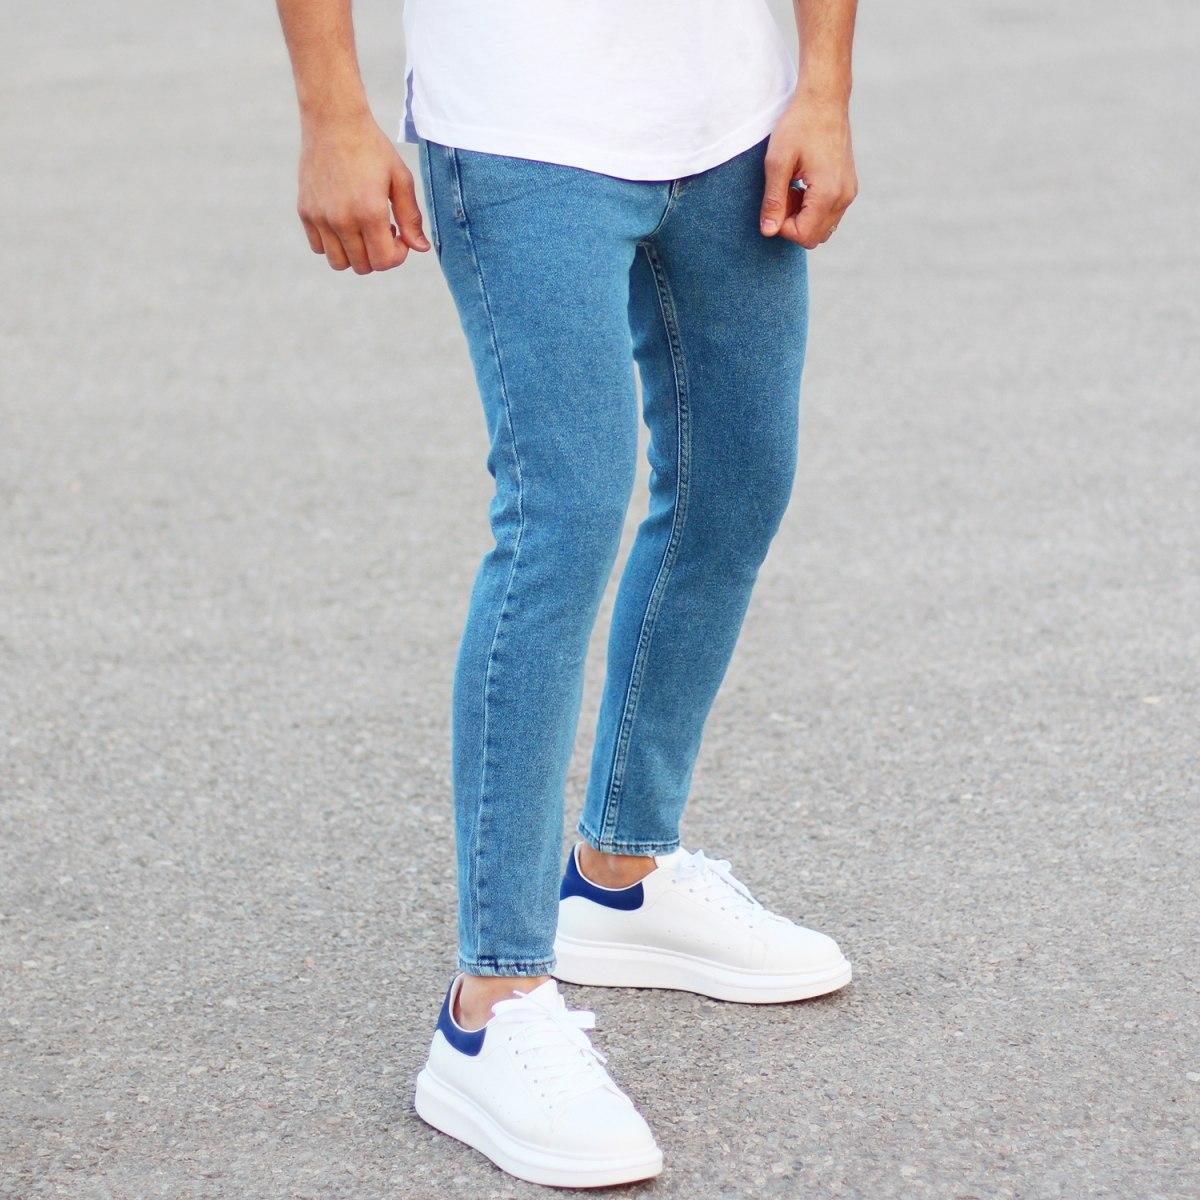 Men's Basic Fit Jeans In Blue Mv Premium Brand - 2